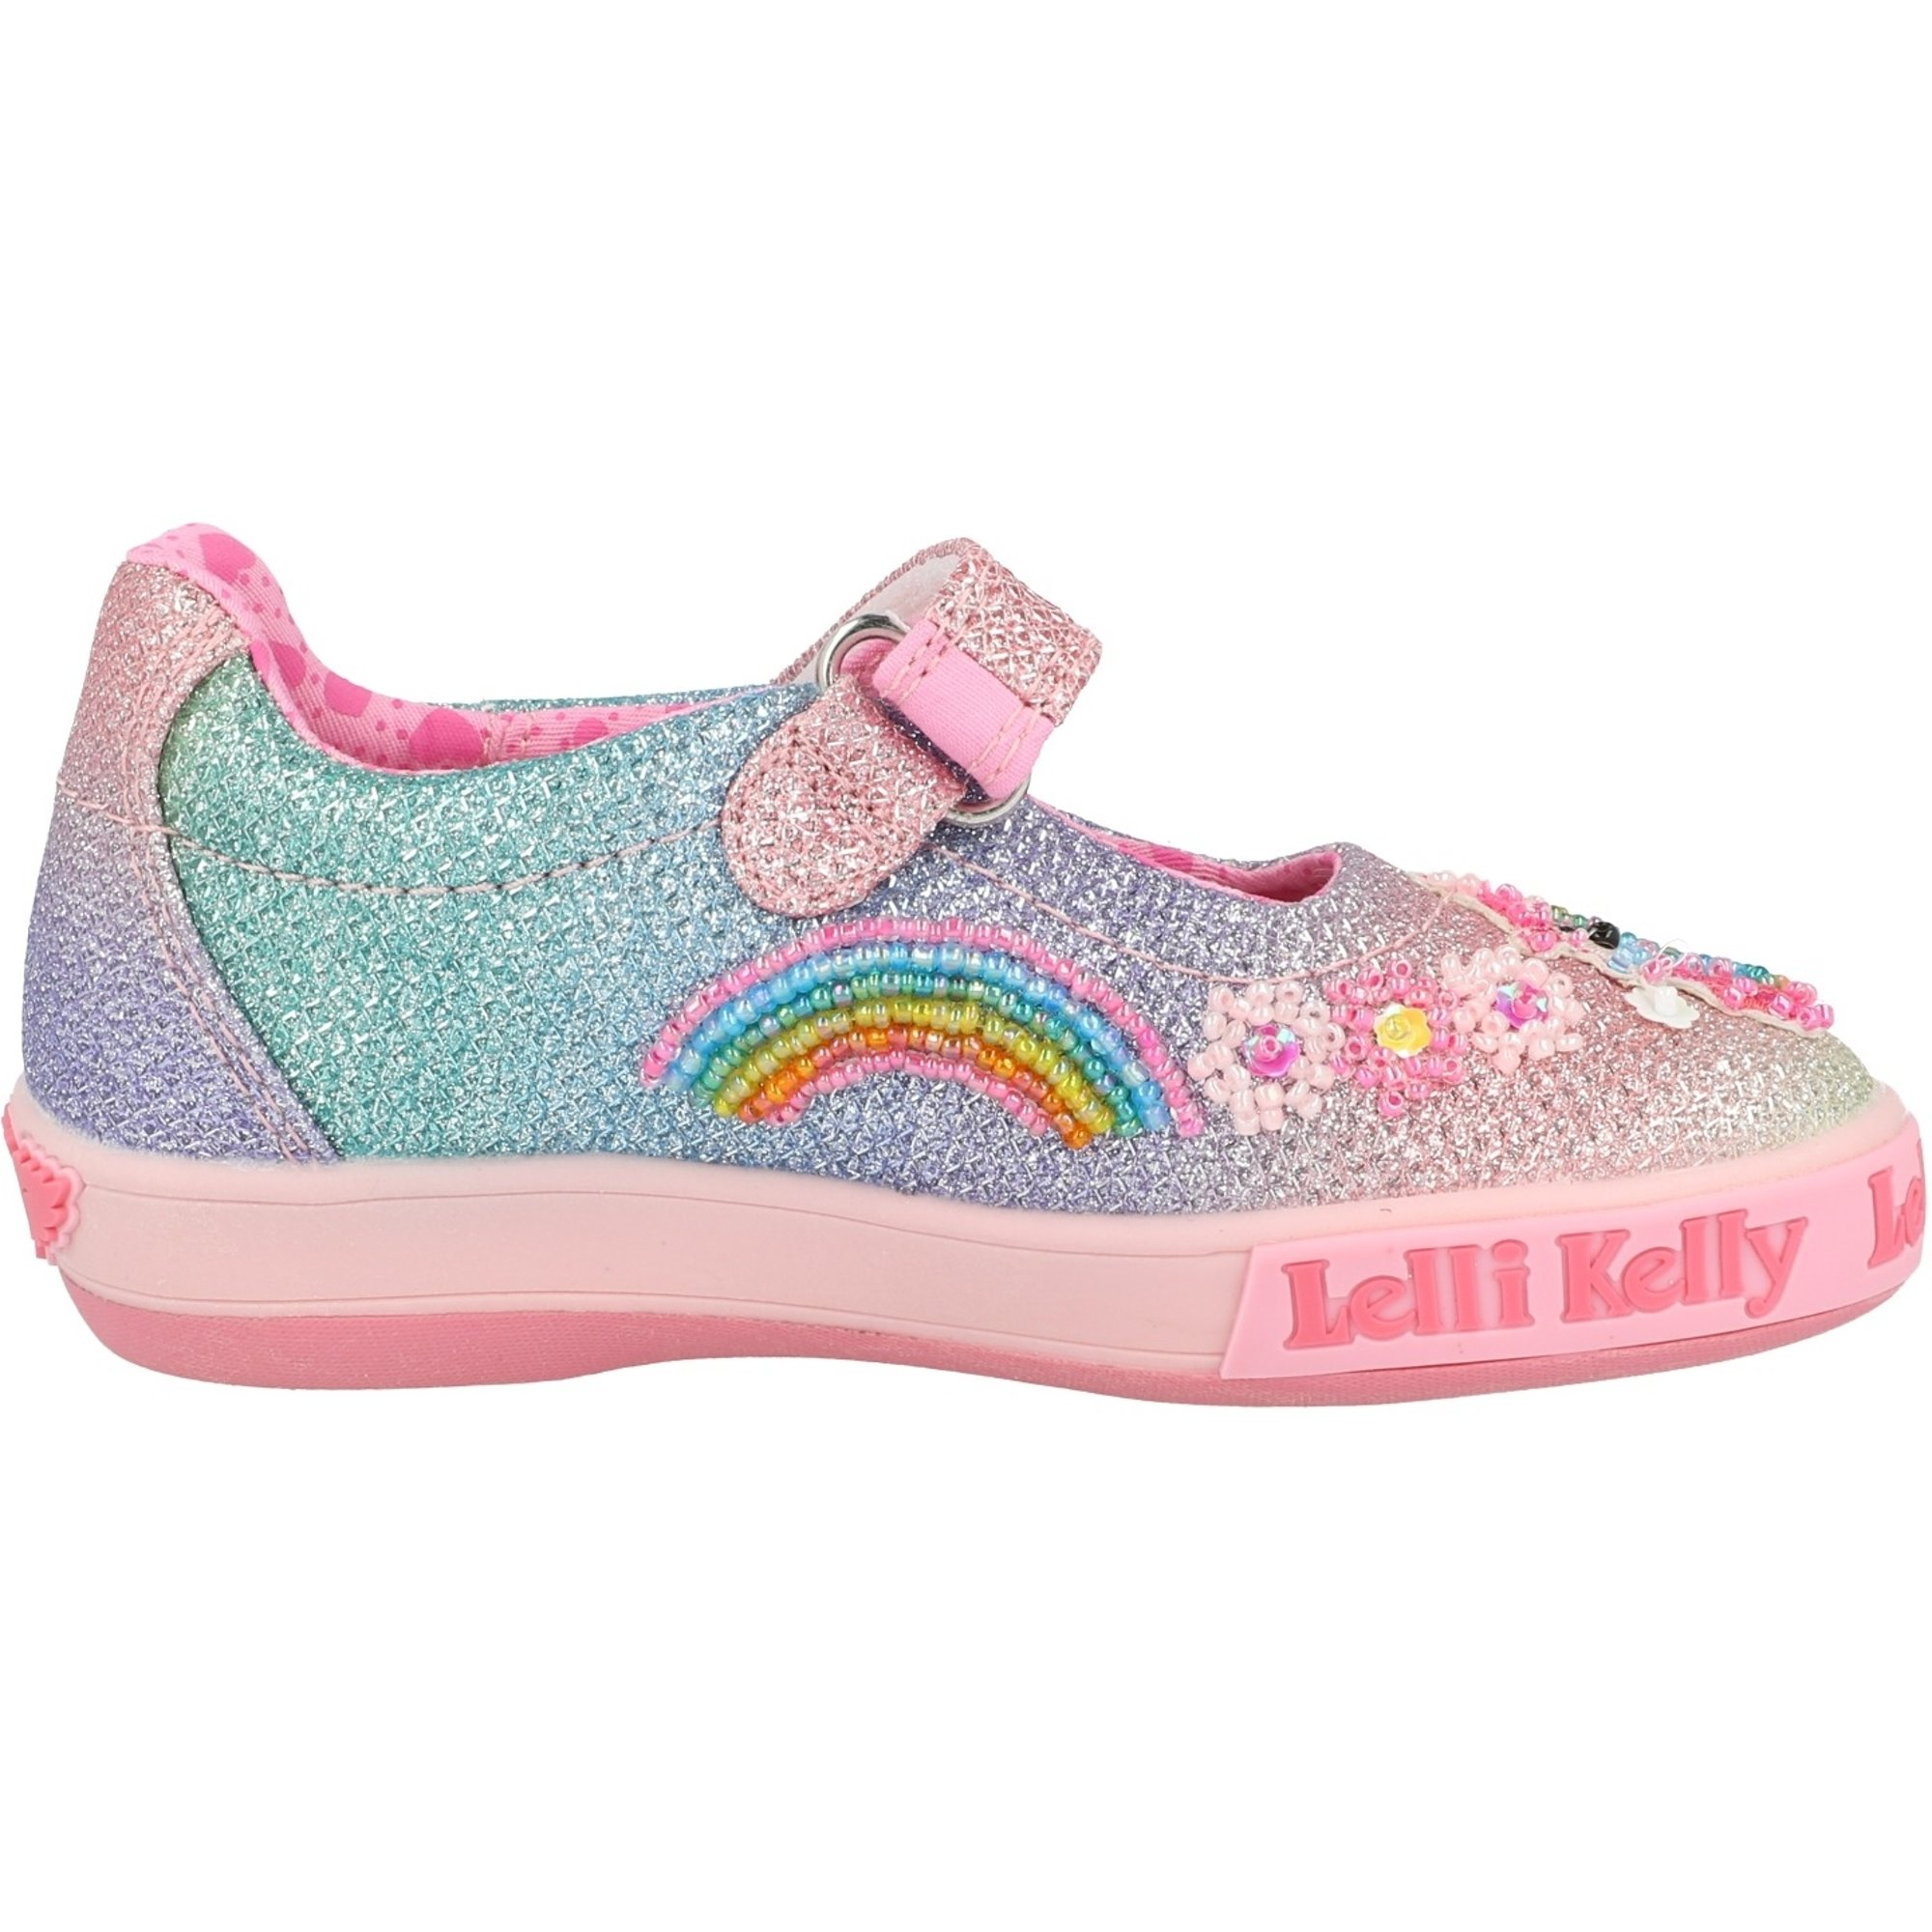 Lelli Kelly Rainbow Unicorn Dolly Multi